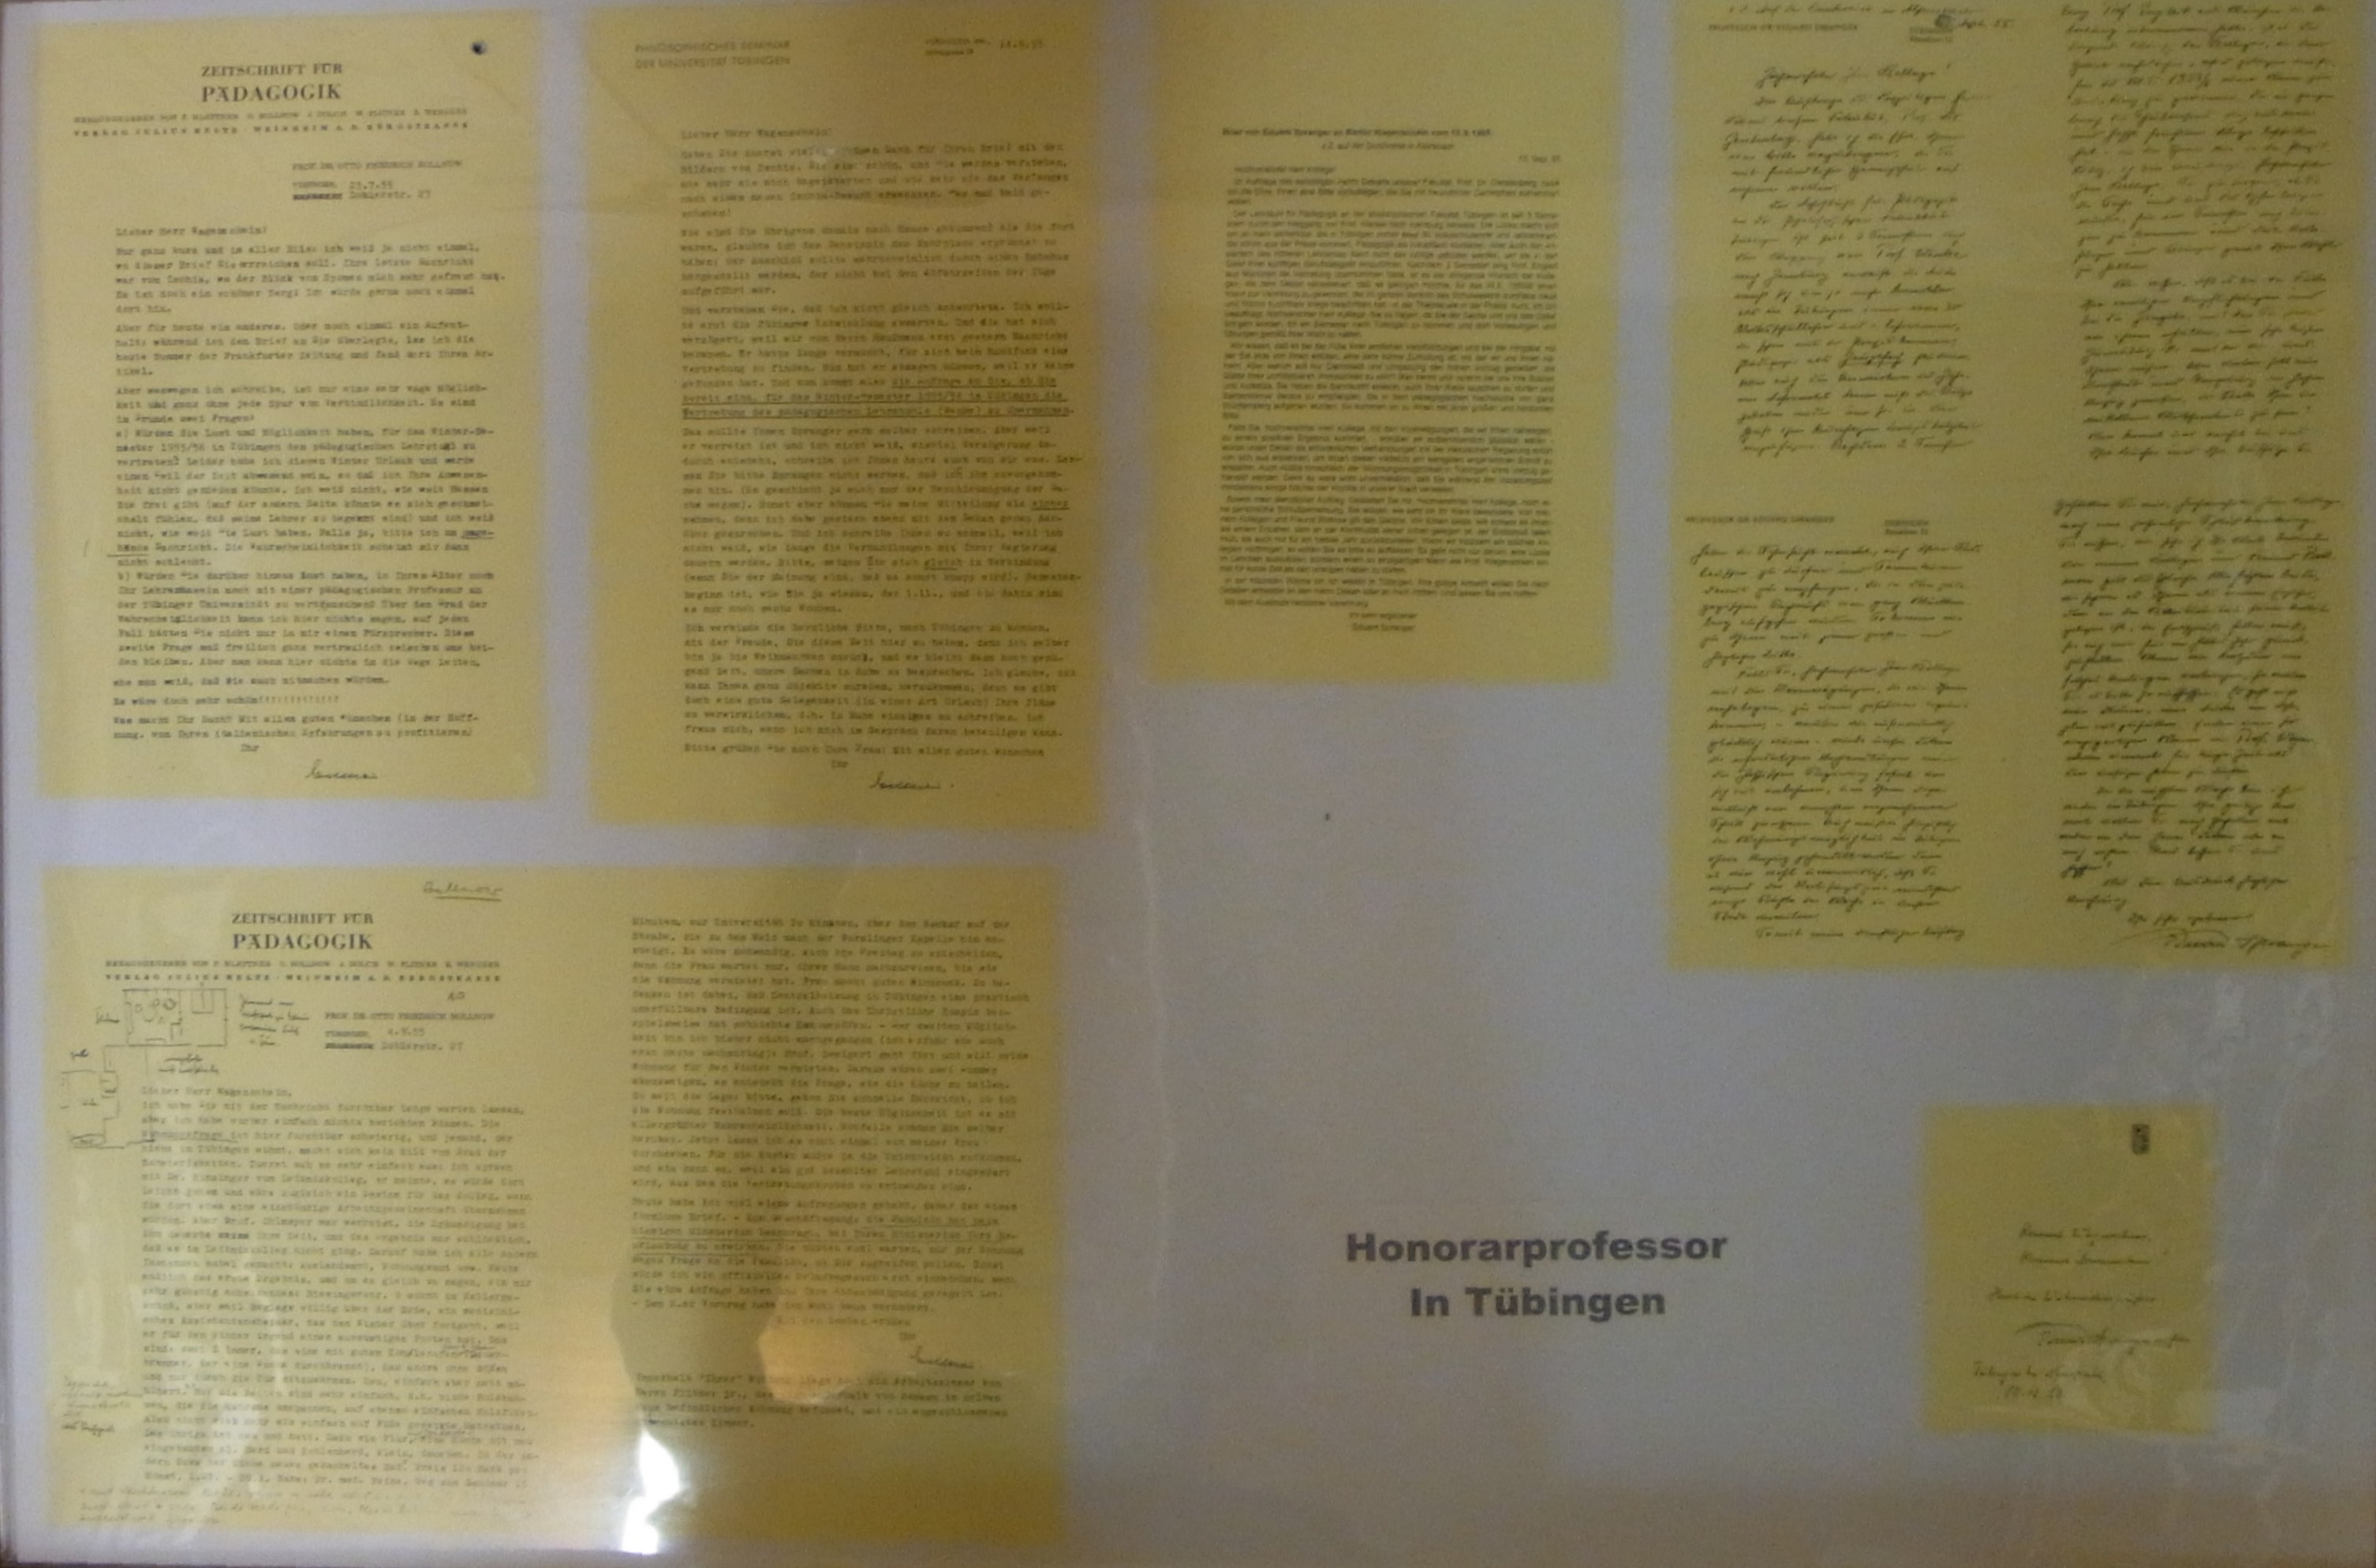 view text speech and dialogue 4th international conference tsd 2001 železná